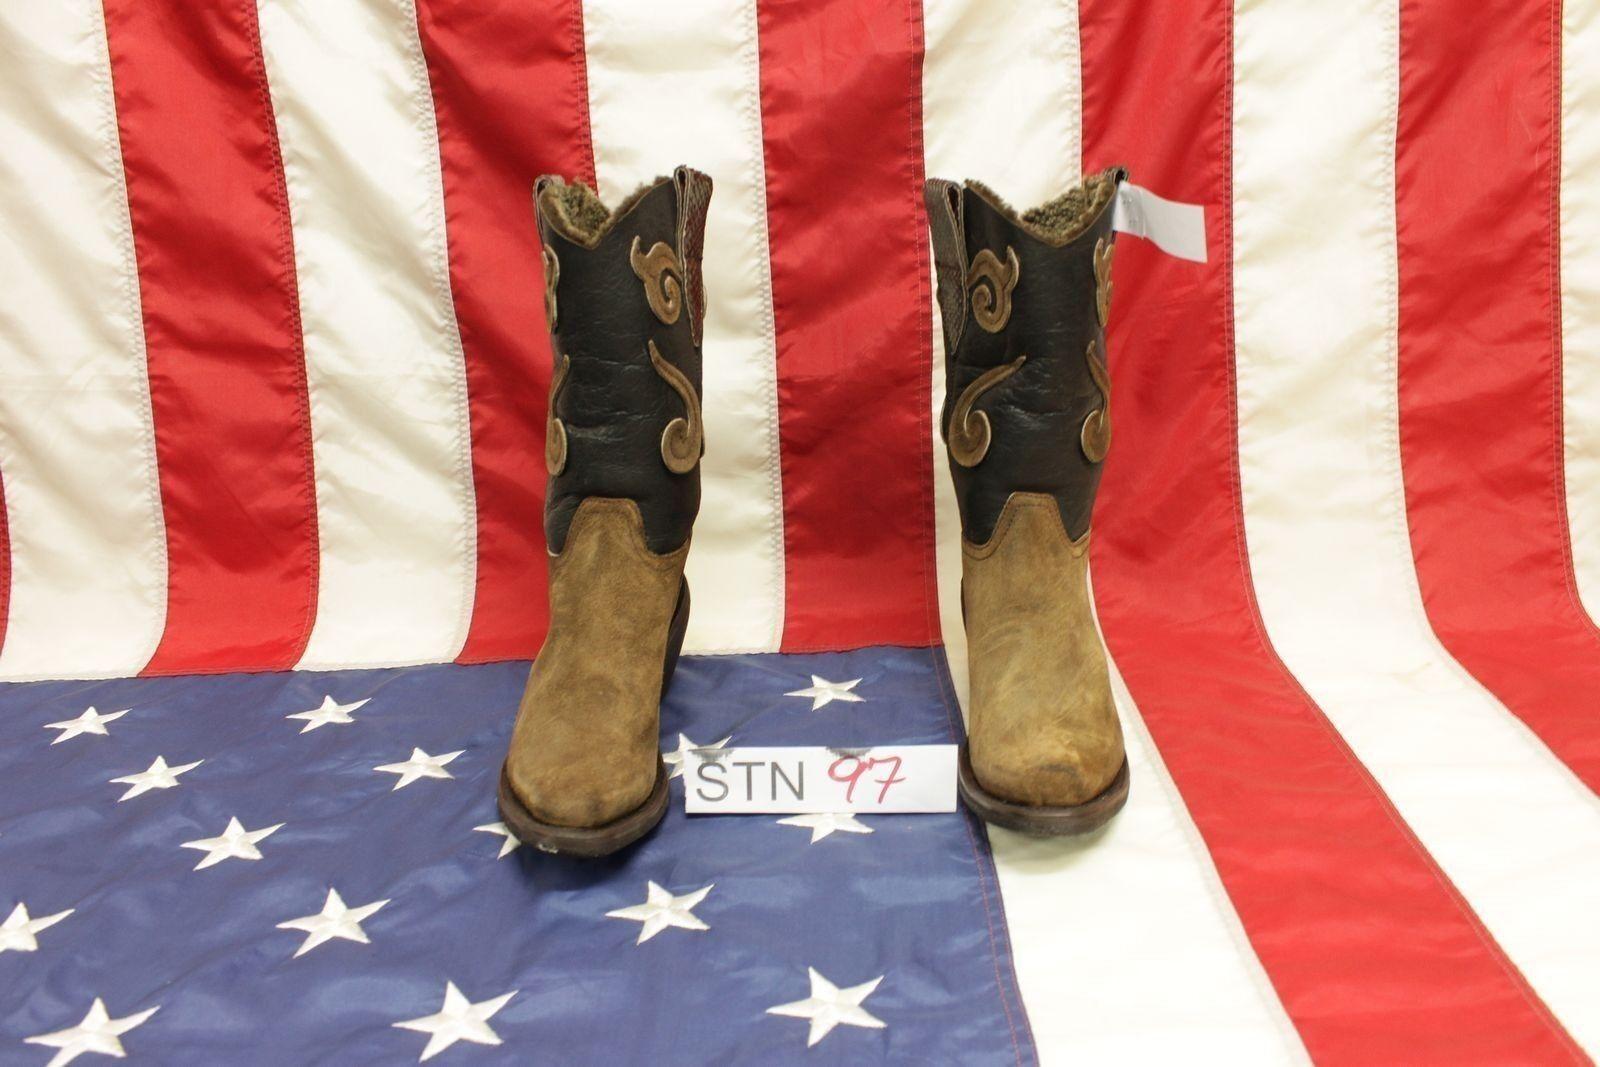 Stiefel Sonora boots neu N.38 (Cod.STN97) camperos country neu boots Stiefeletten Frau 7e4dc5